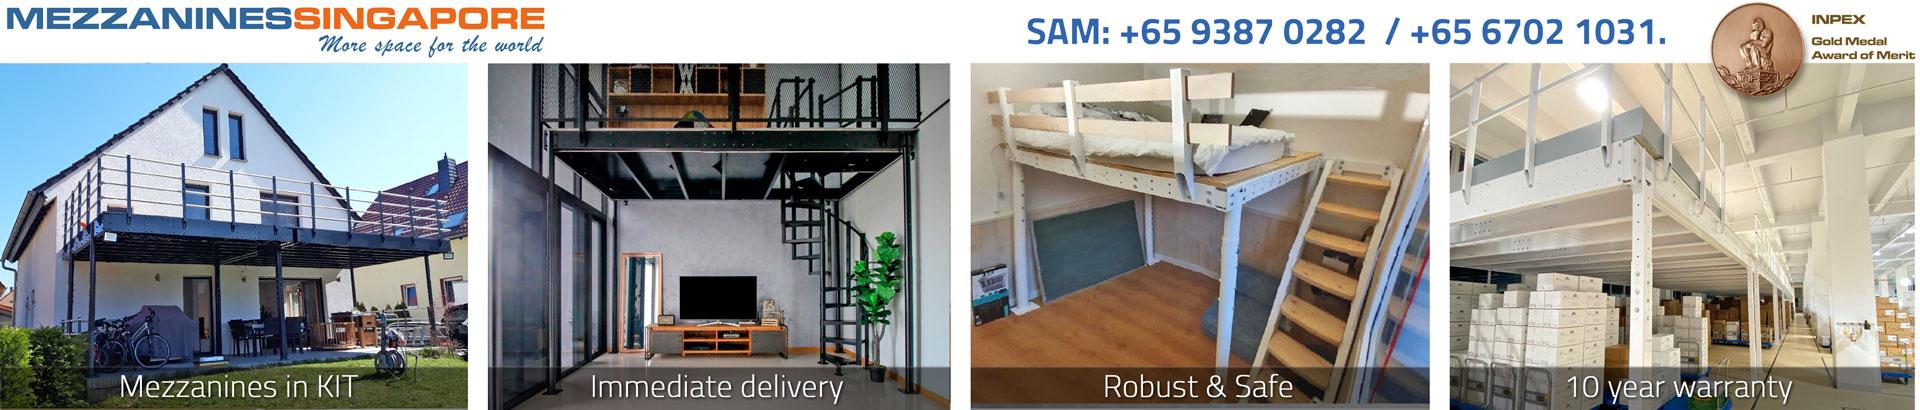 Mezzanines kit - MezzaninesSingapore.com